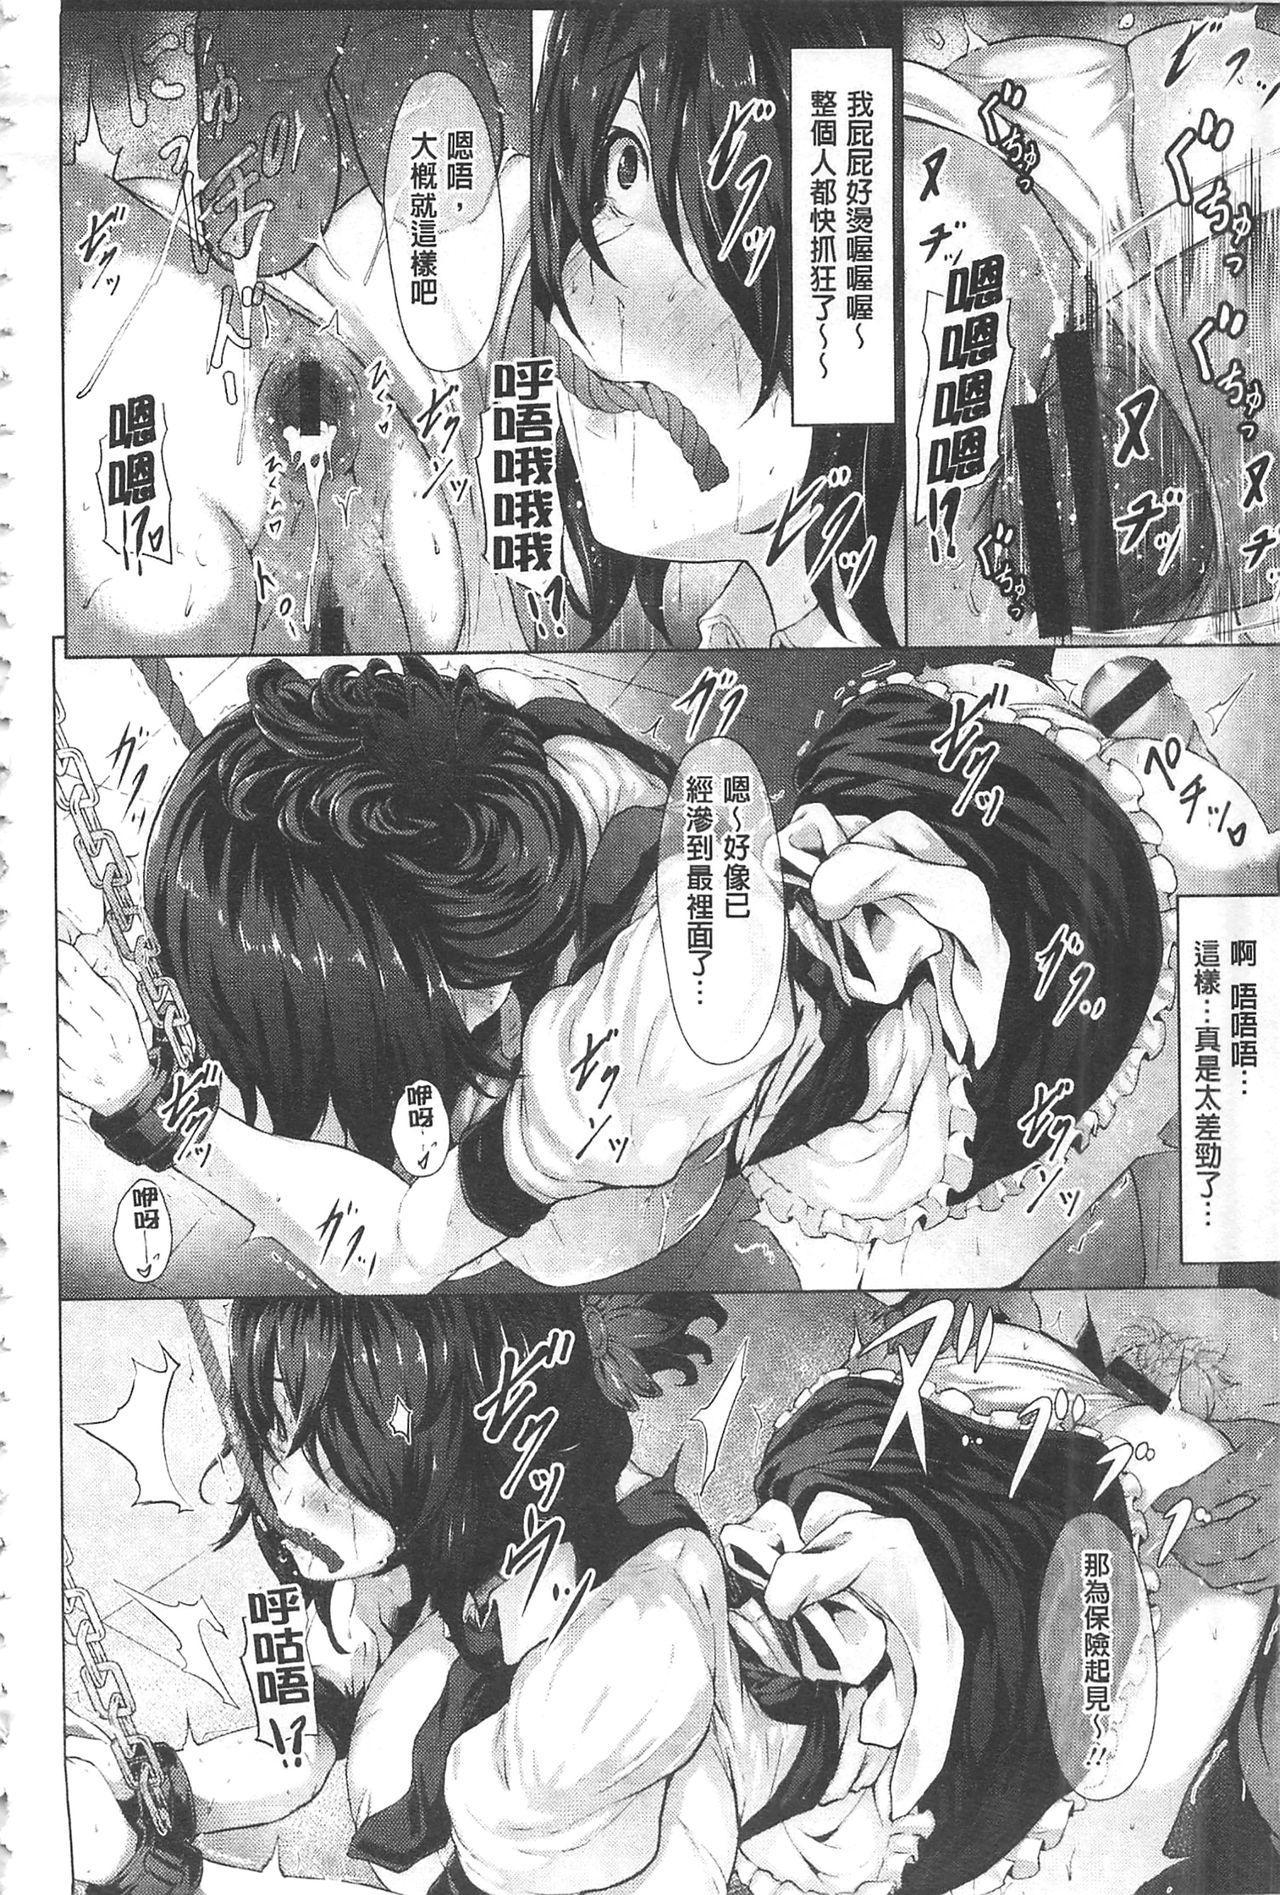 [Lorica] Biinkan Anal ~Kakusei Nejikomi Ana~ | 美淫感猥菊花 塞入擴張覺醒穴 [Chinese] 18